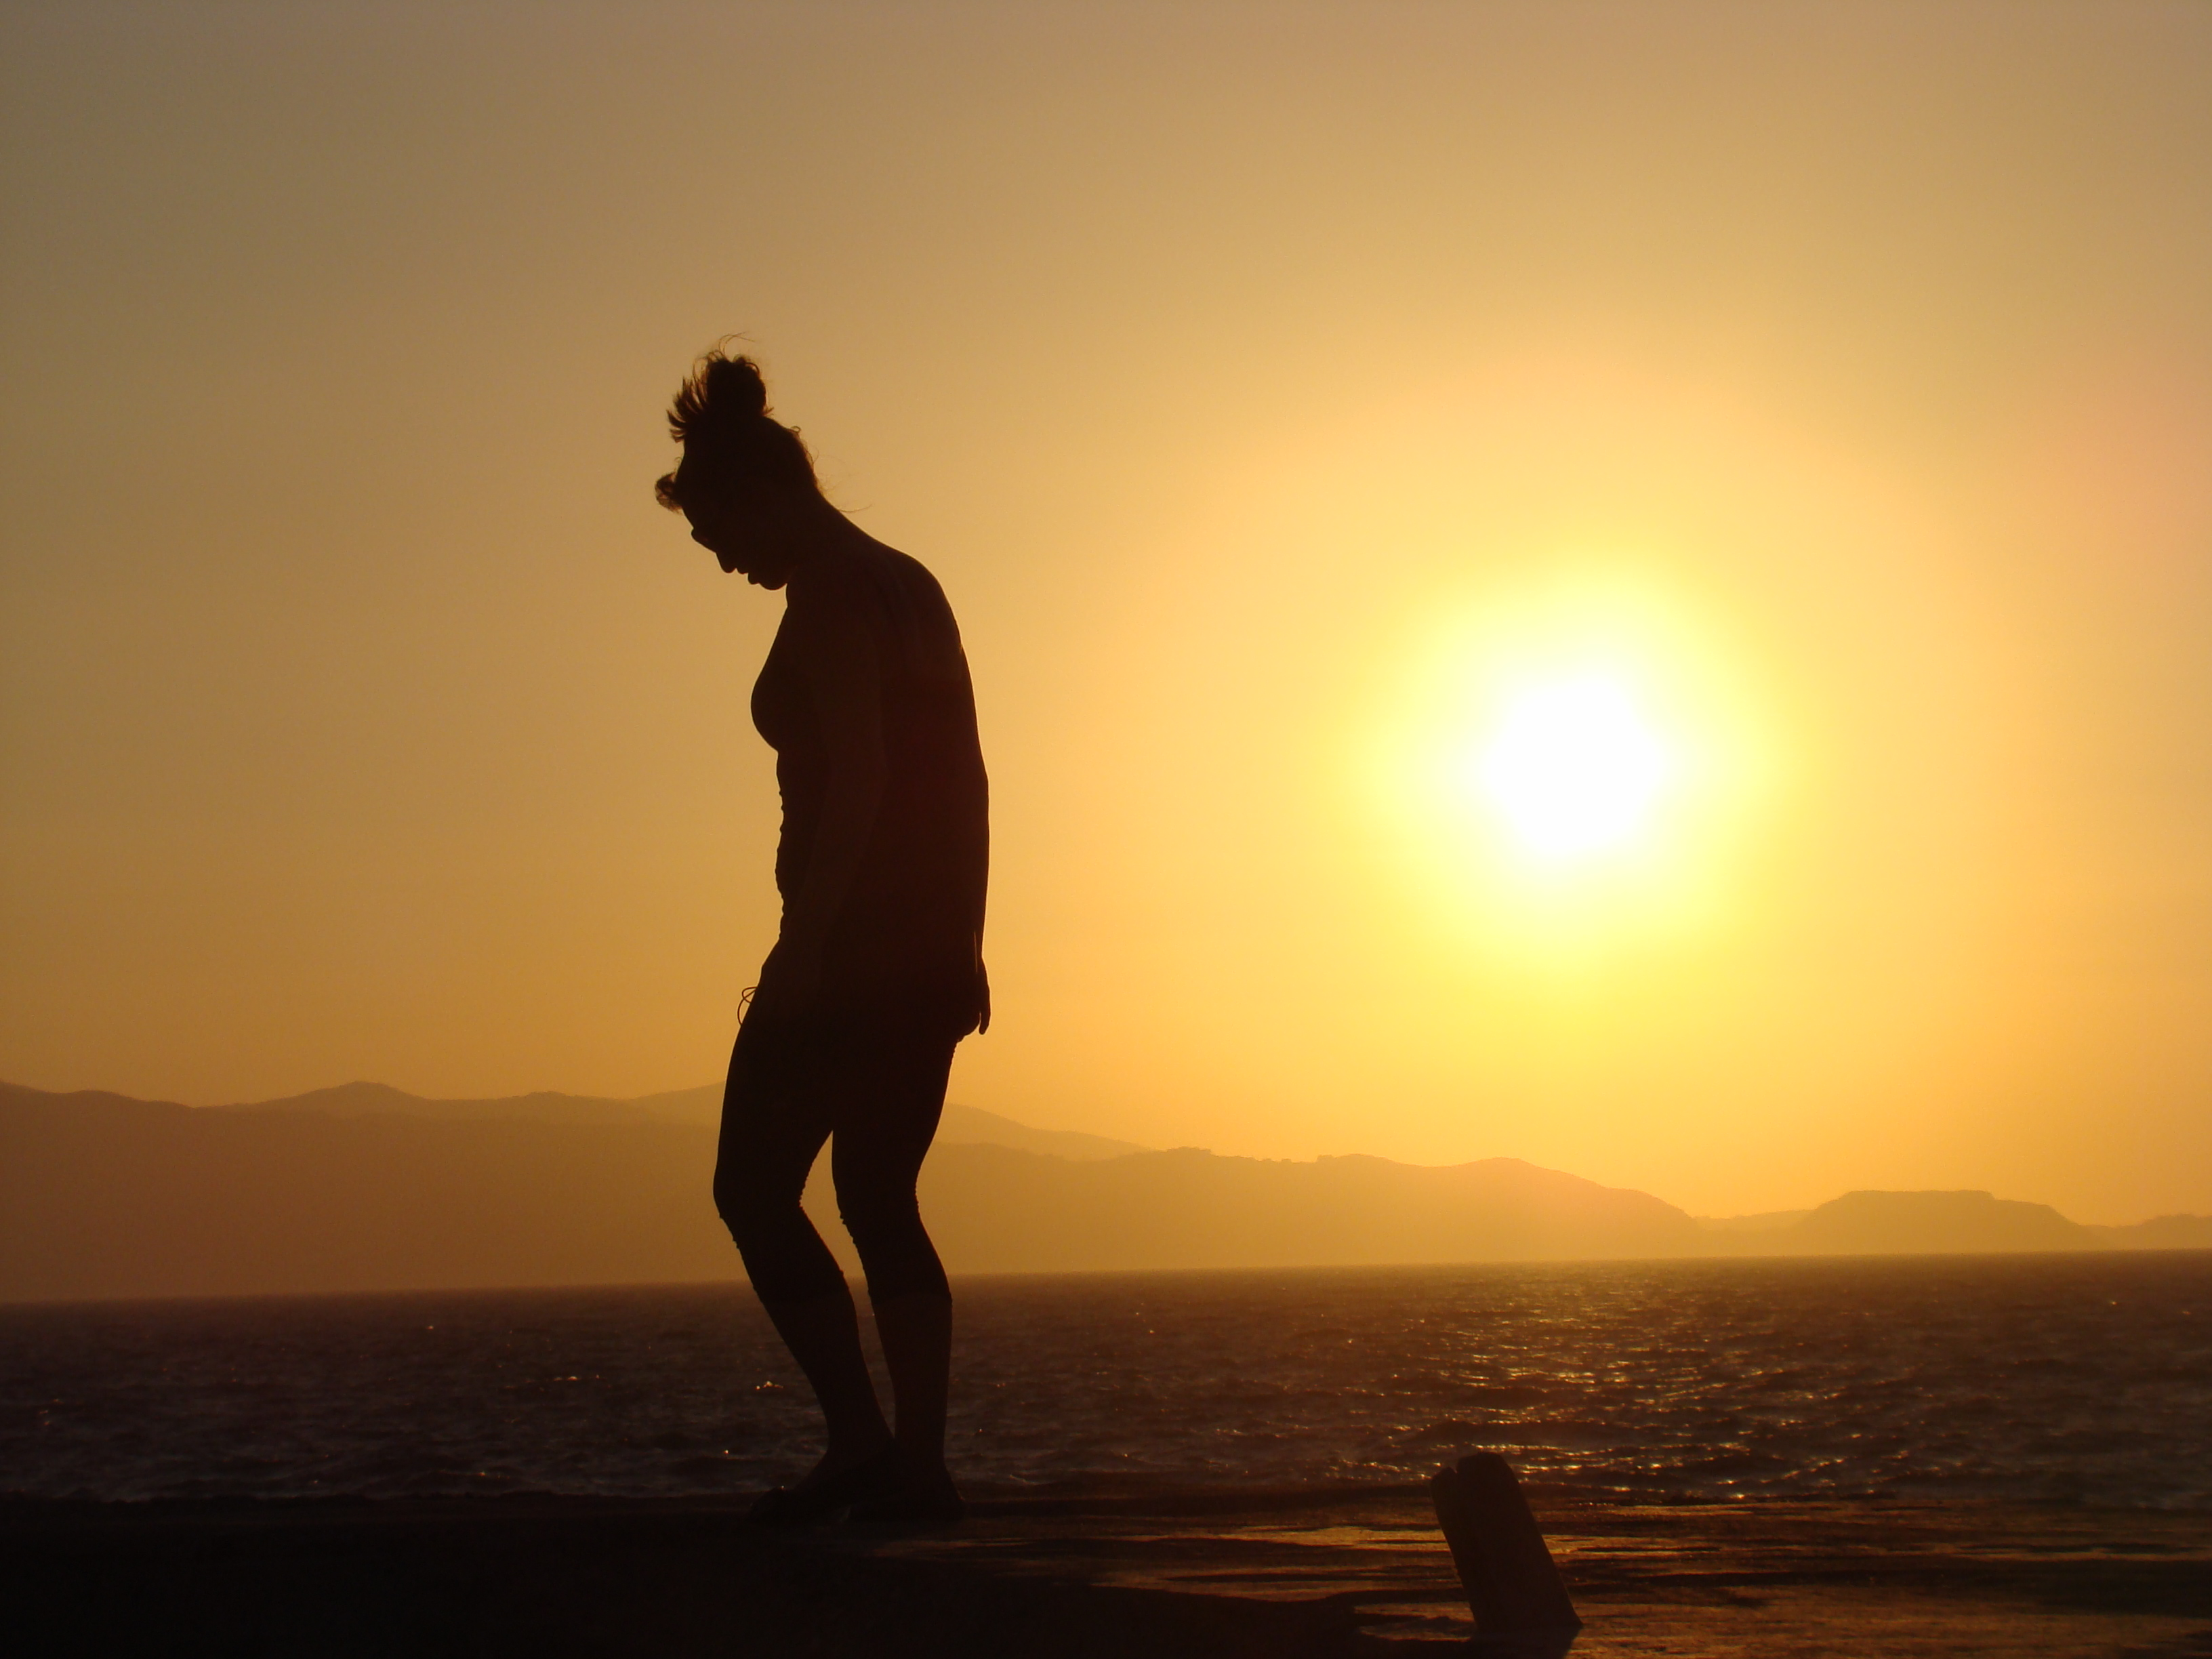 From_Koyle_of_Heraklion_Crete